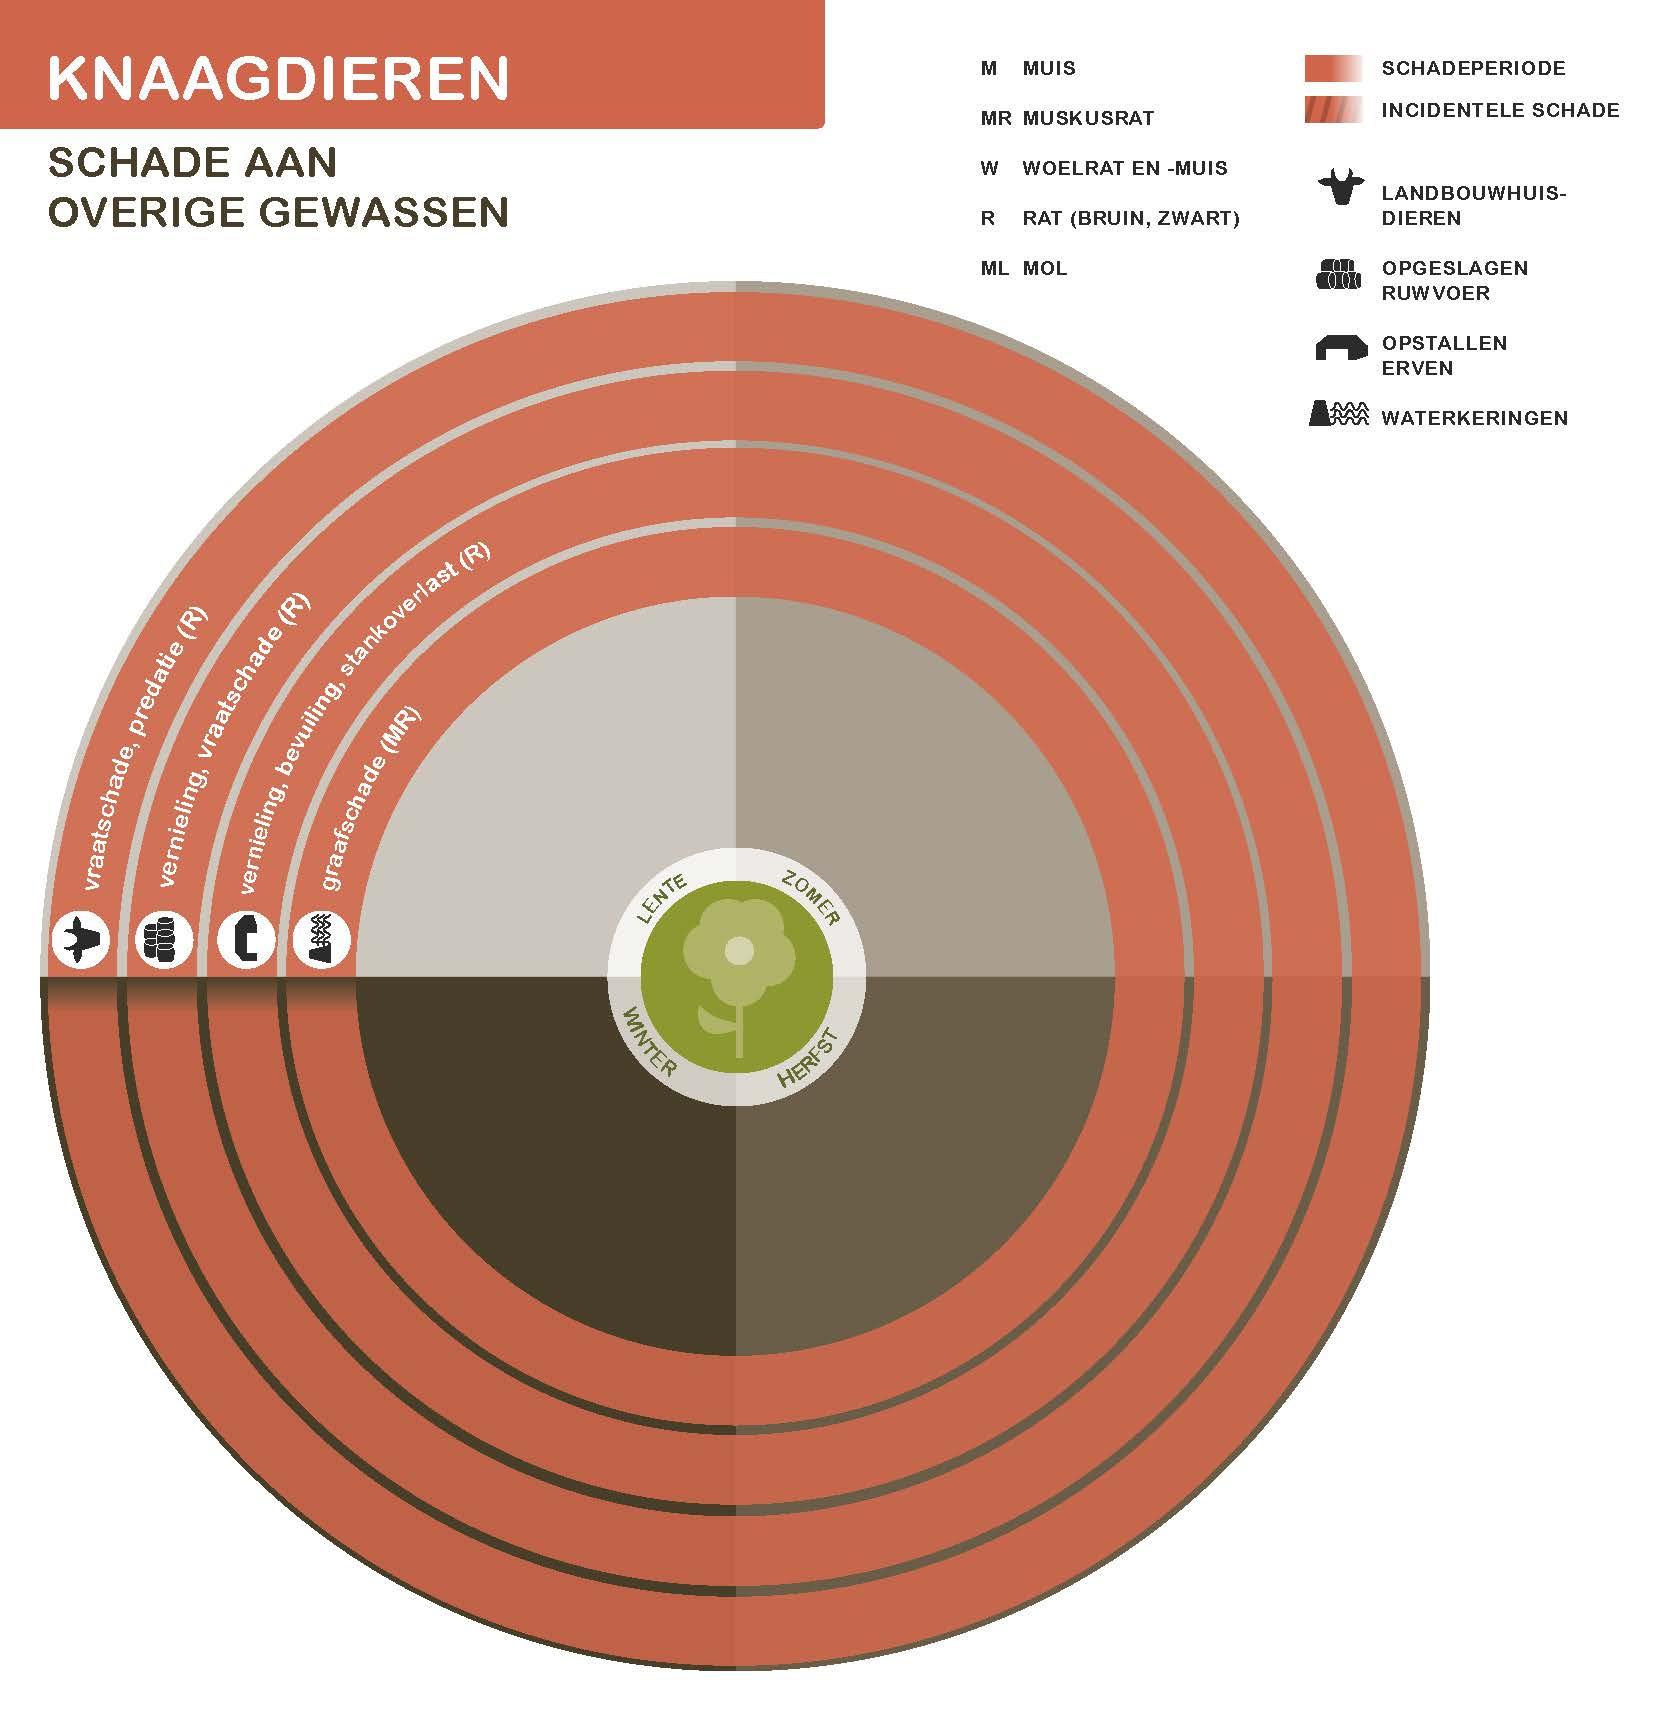 FPK-infogr-knaagd-overig-3